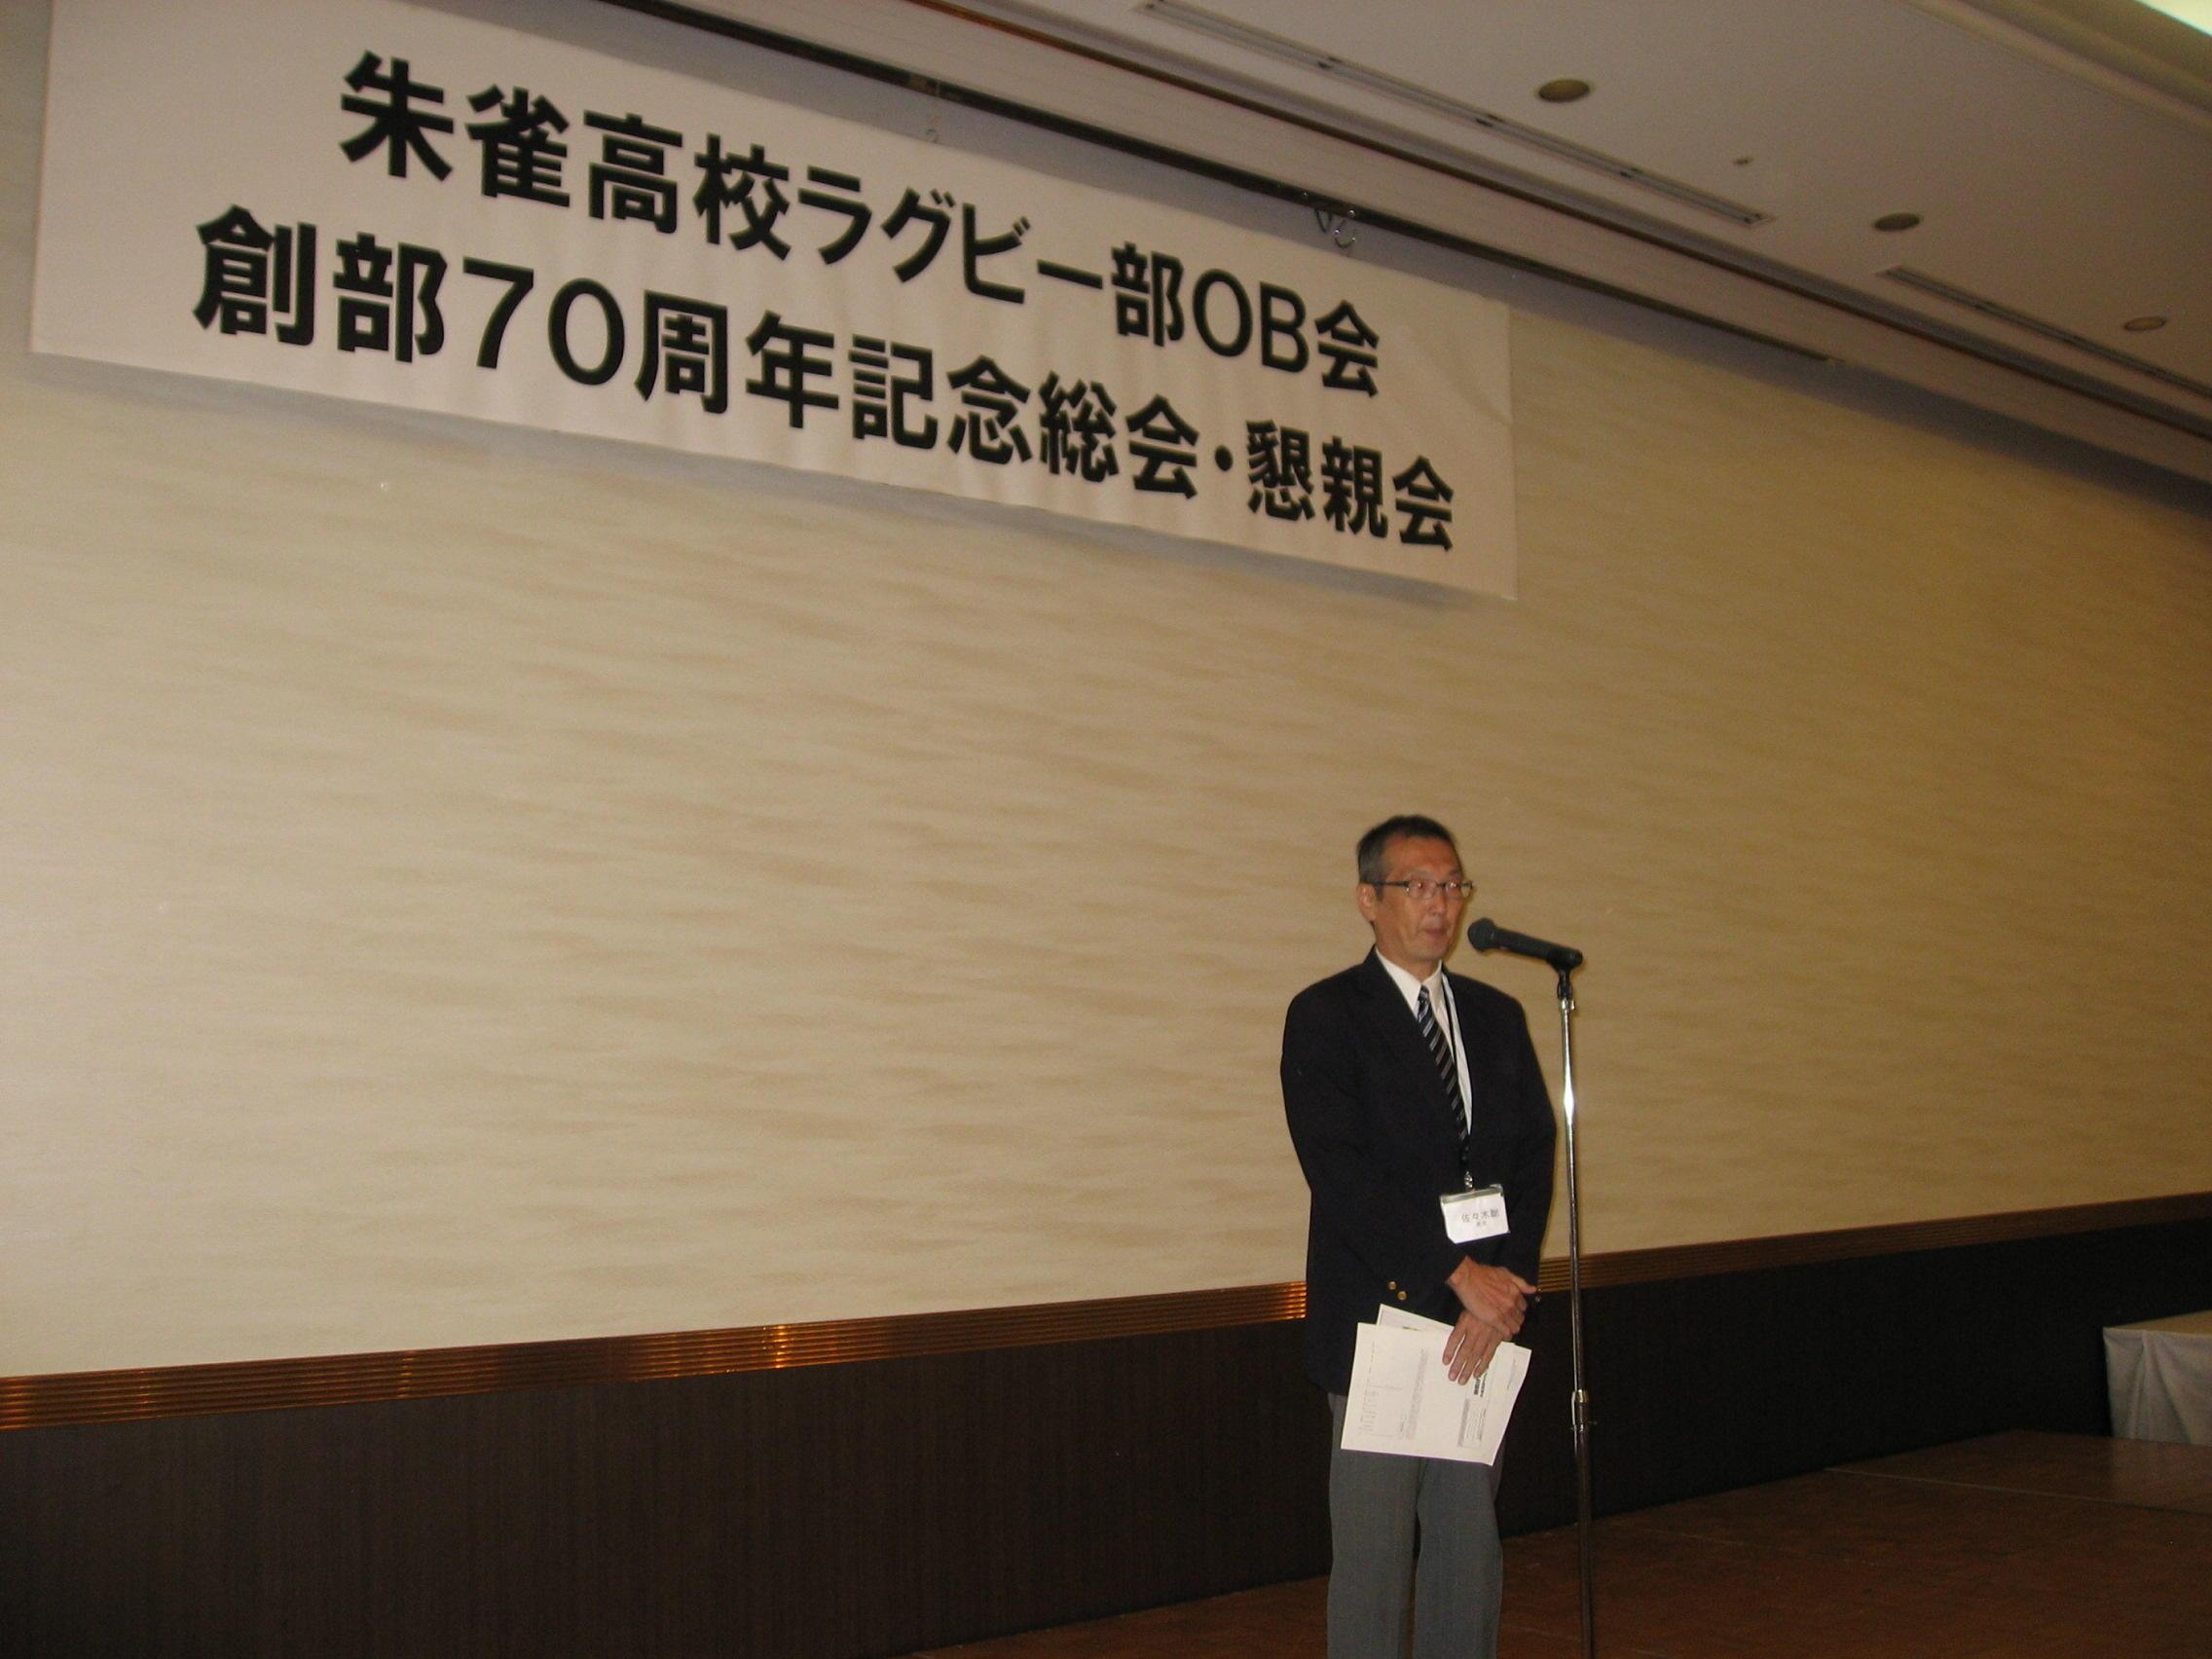 http://www.kyoto-be.ne.jp/suzaku-hs/mt/dousoukai/images/IMG_0996.JPG